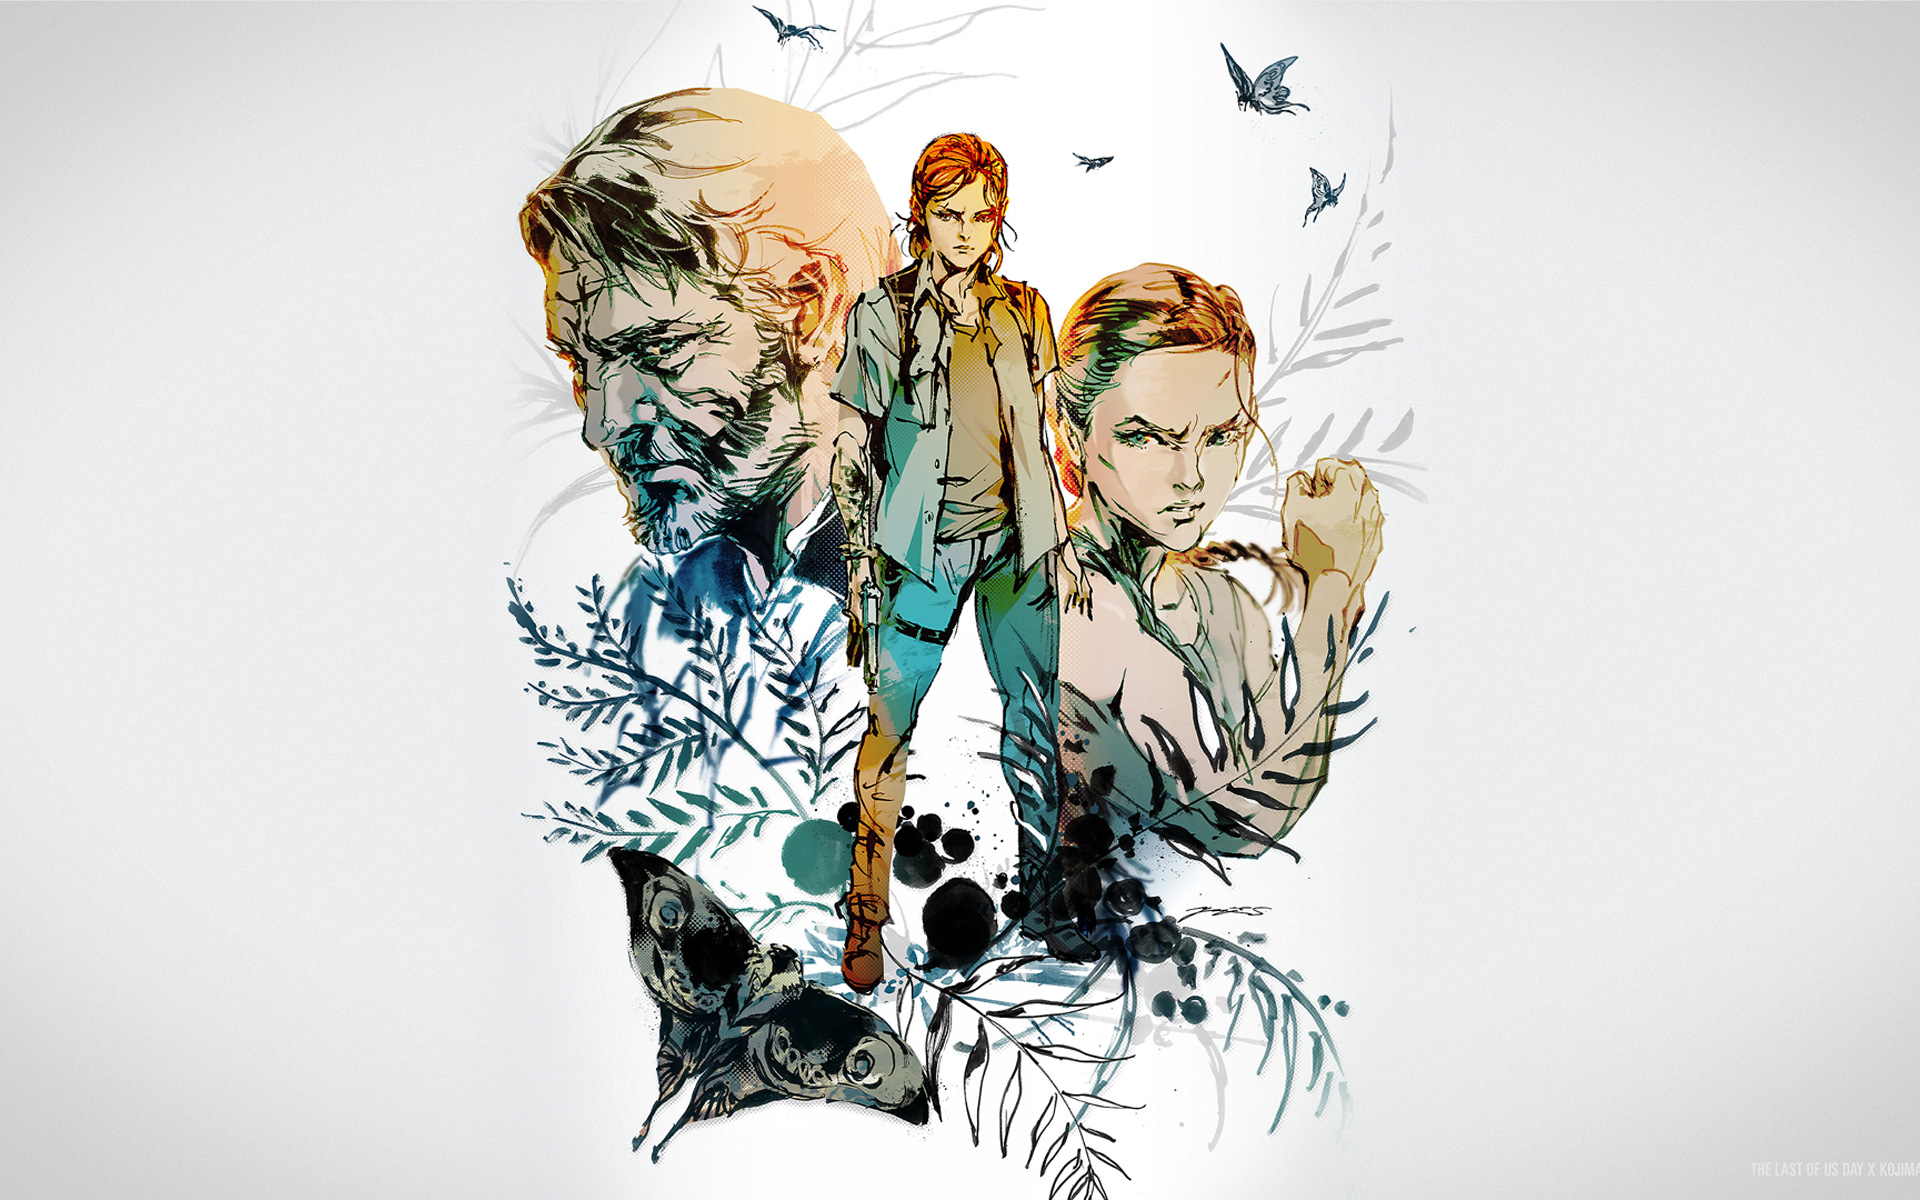 Free The Last of Us Part II Wallpaper in 1920x1200